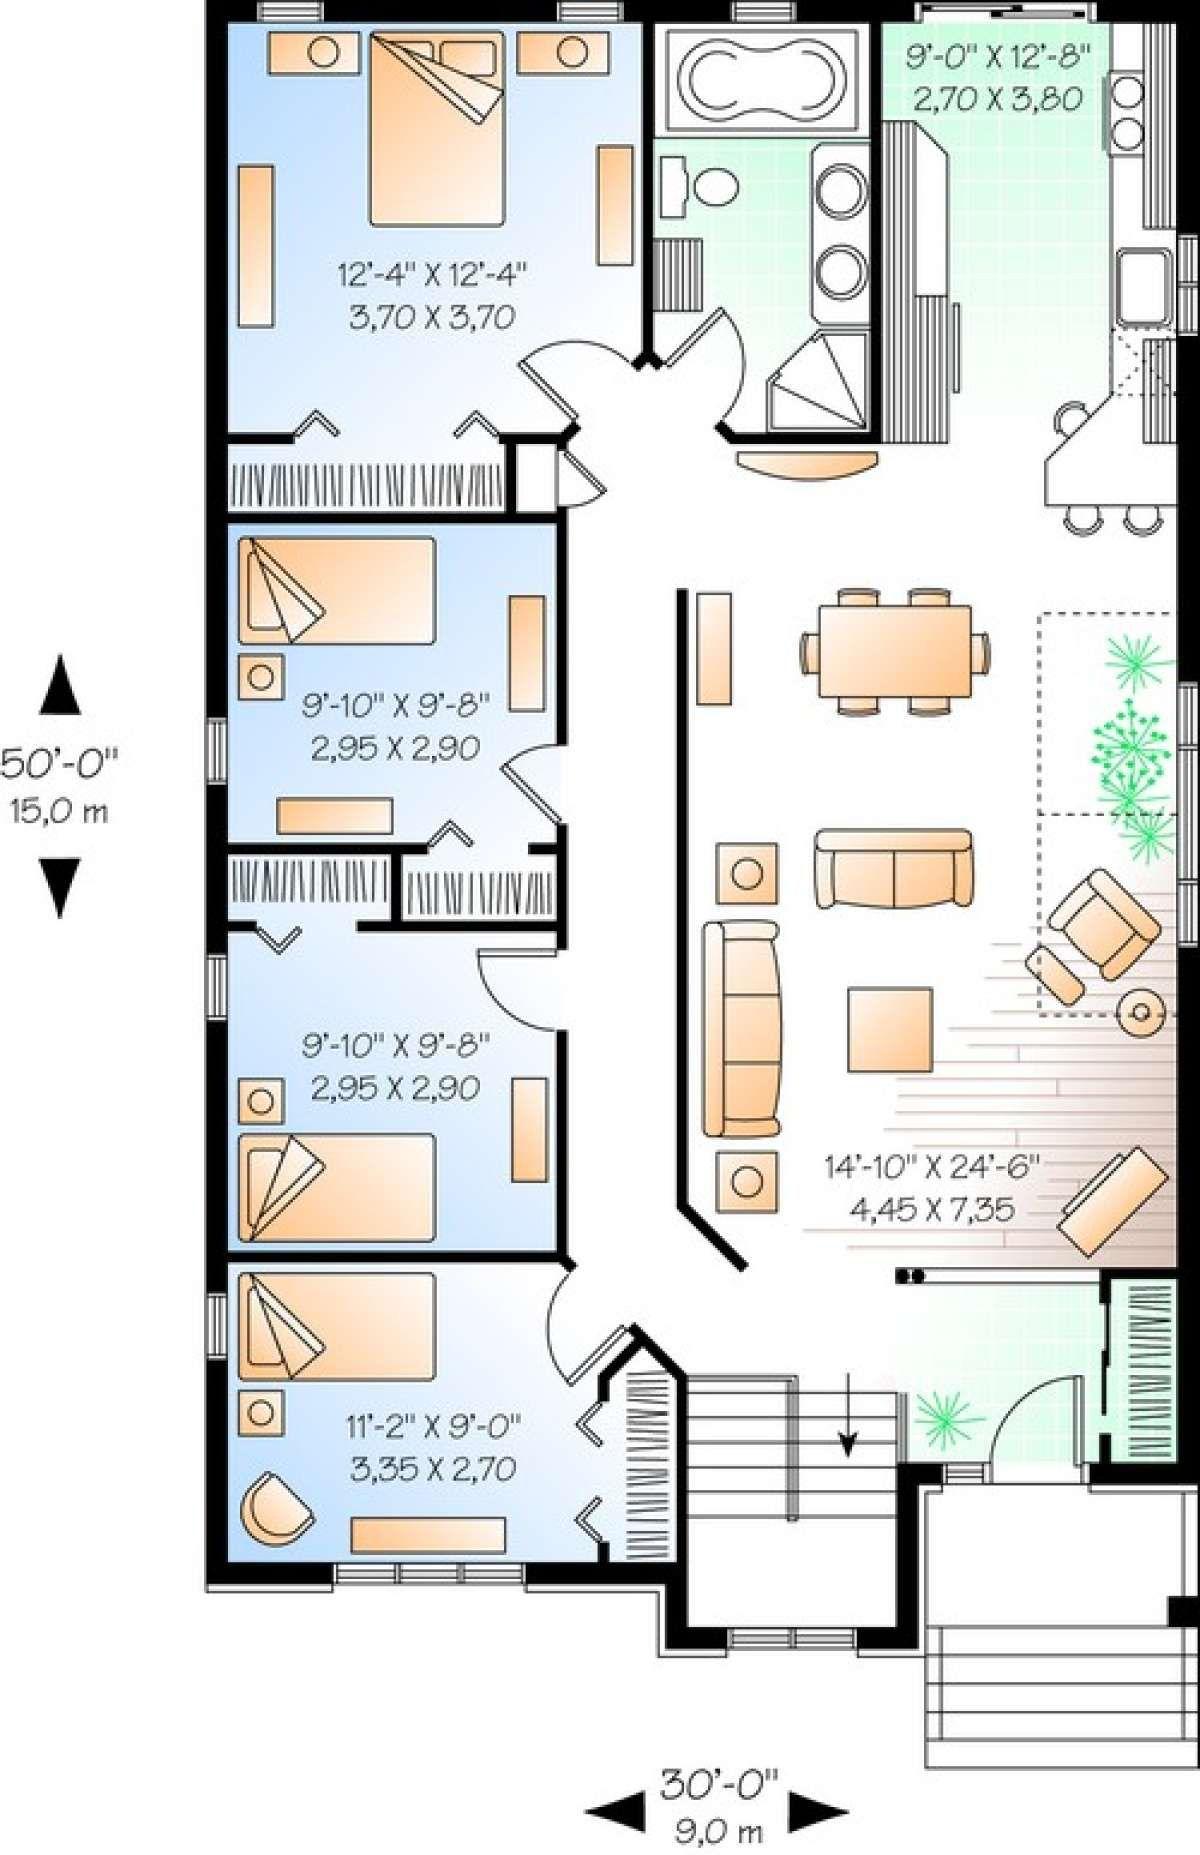 House Plan 034 00695 Narrow Lot Plan 1 433 Square Feet 4 Bedrooms 1 Bathroom In 2021 House Layout Plans House Plans House Layouts